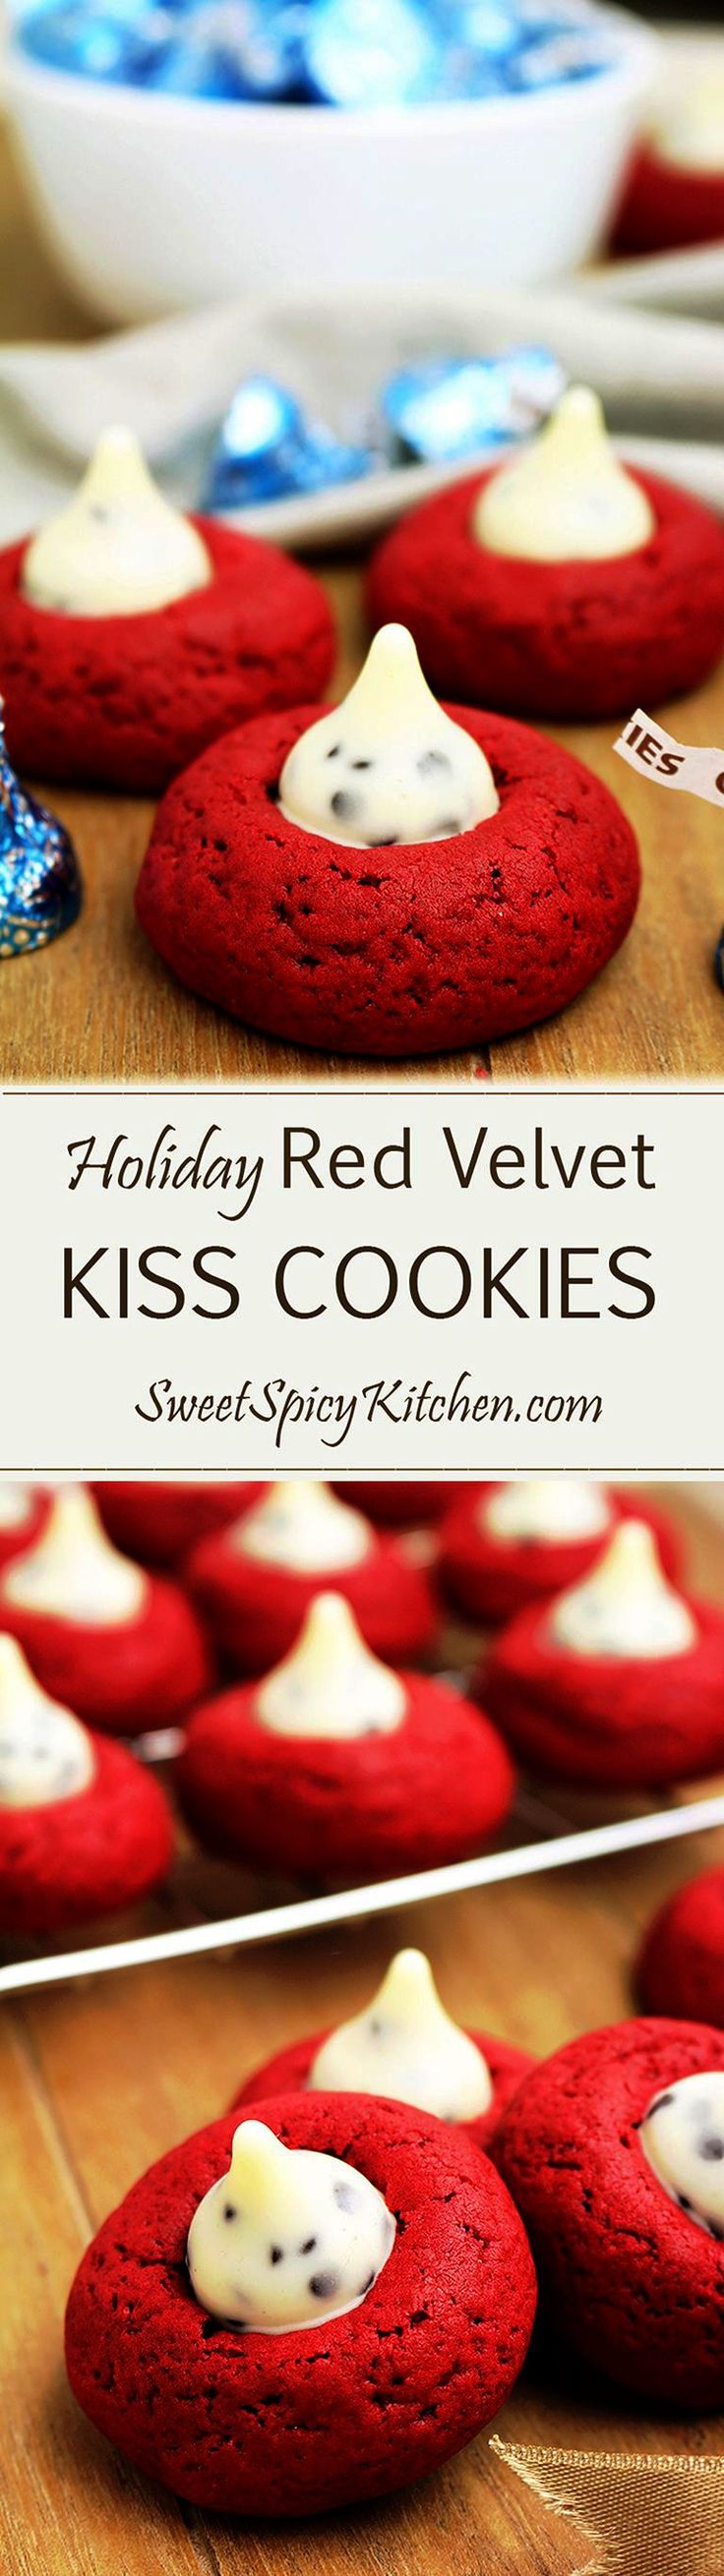 Fairytale Brownies Christmas Cookies & BiteSize Magic